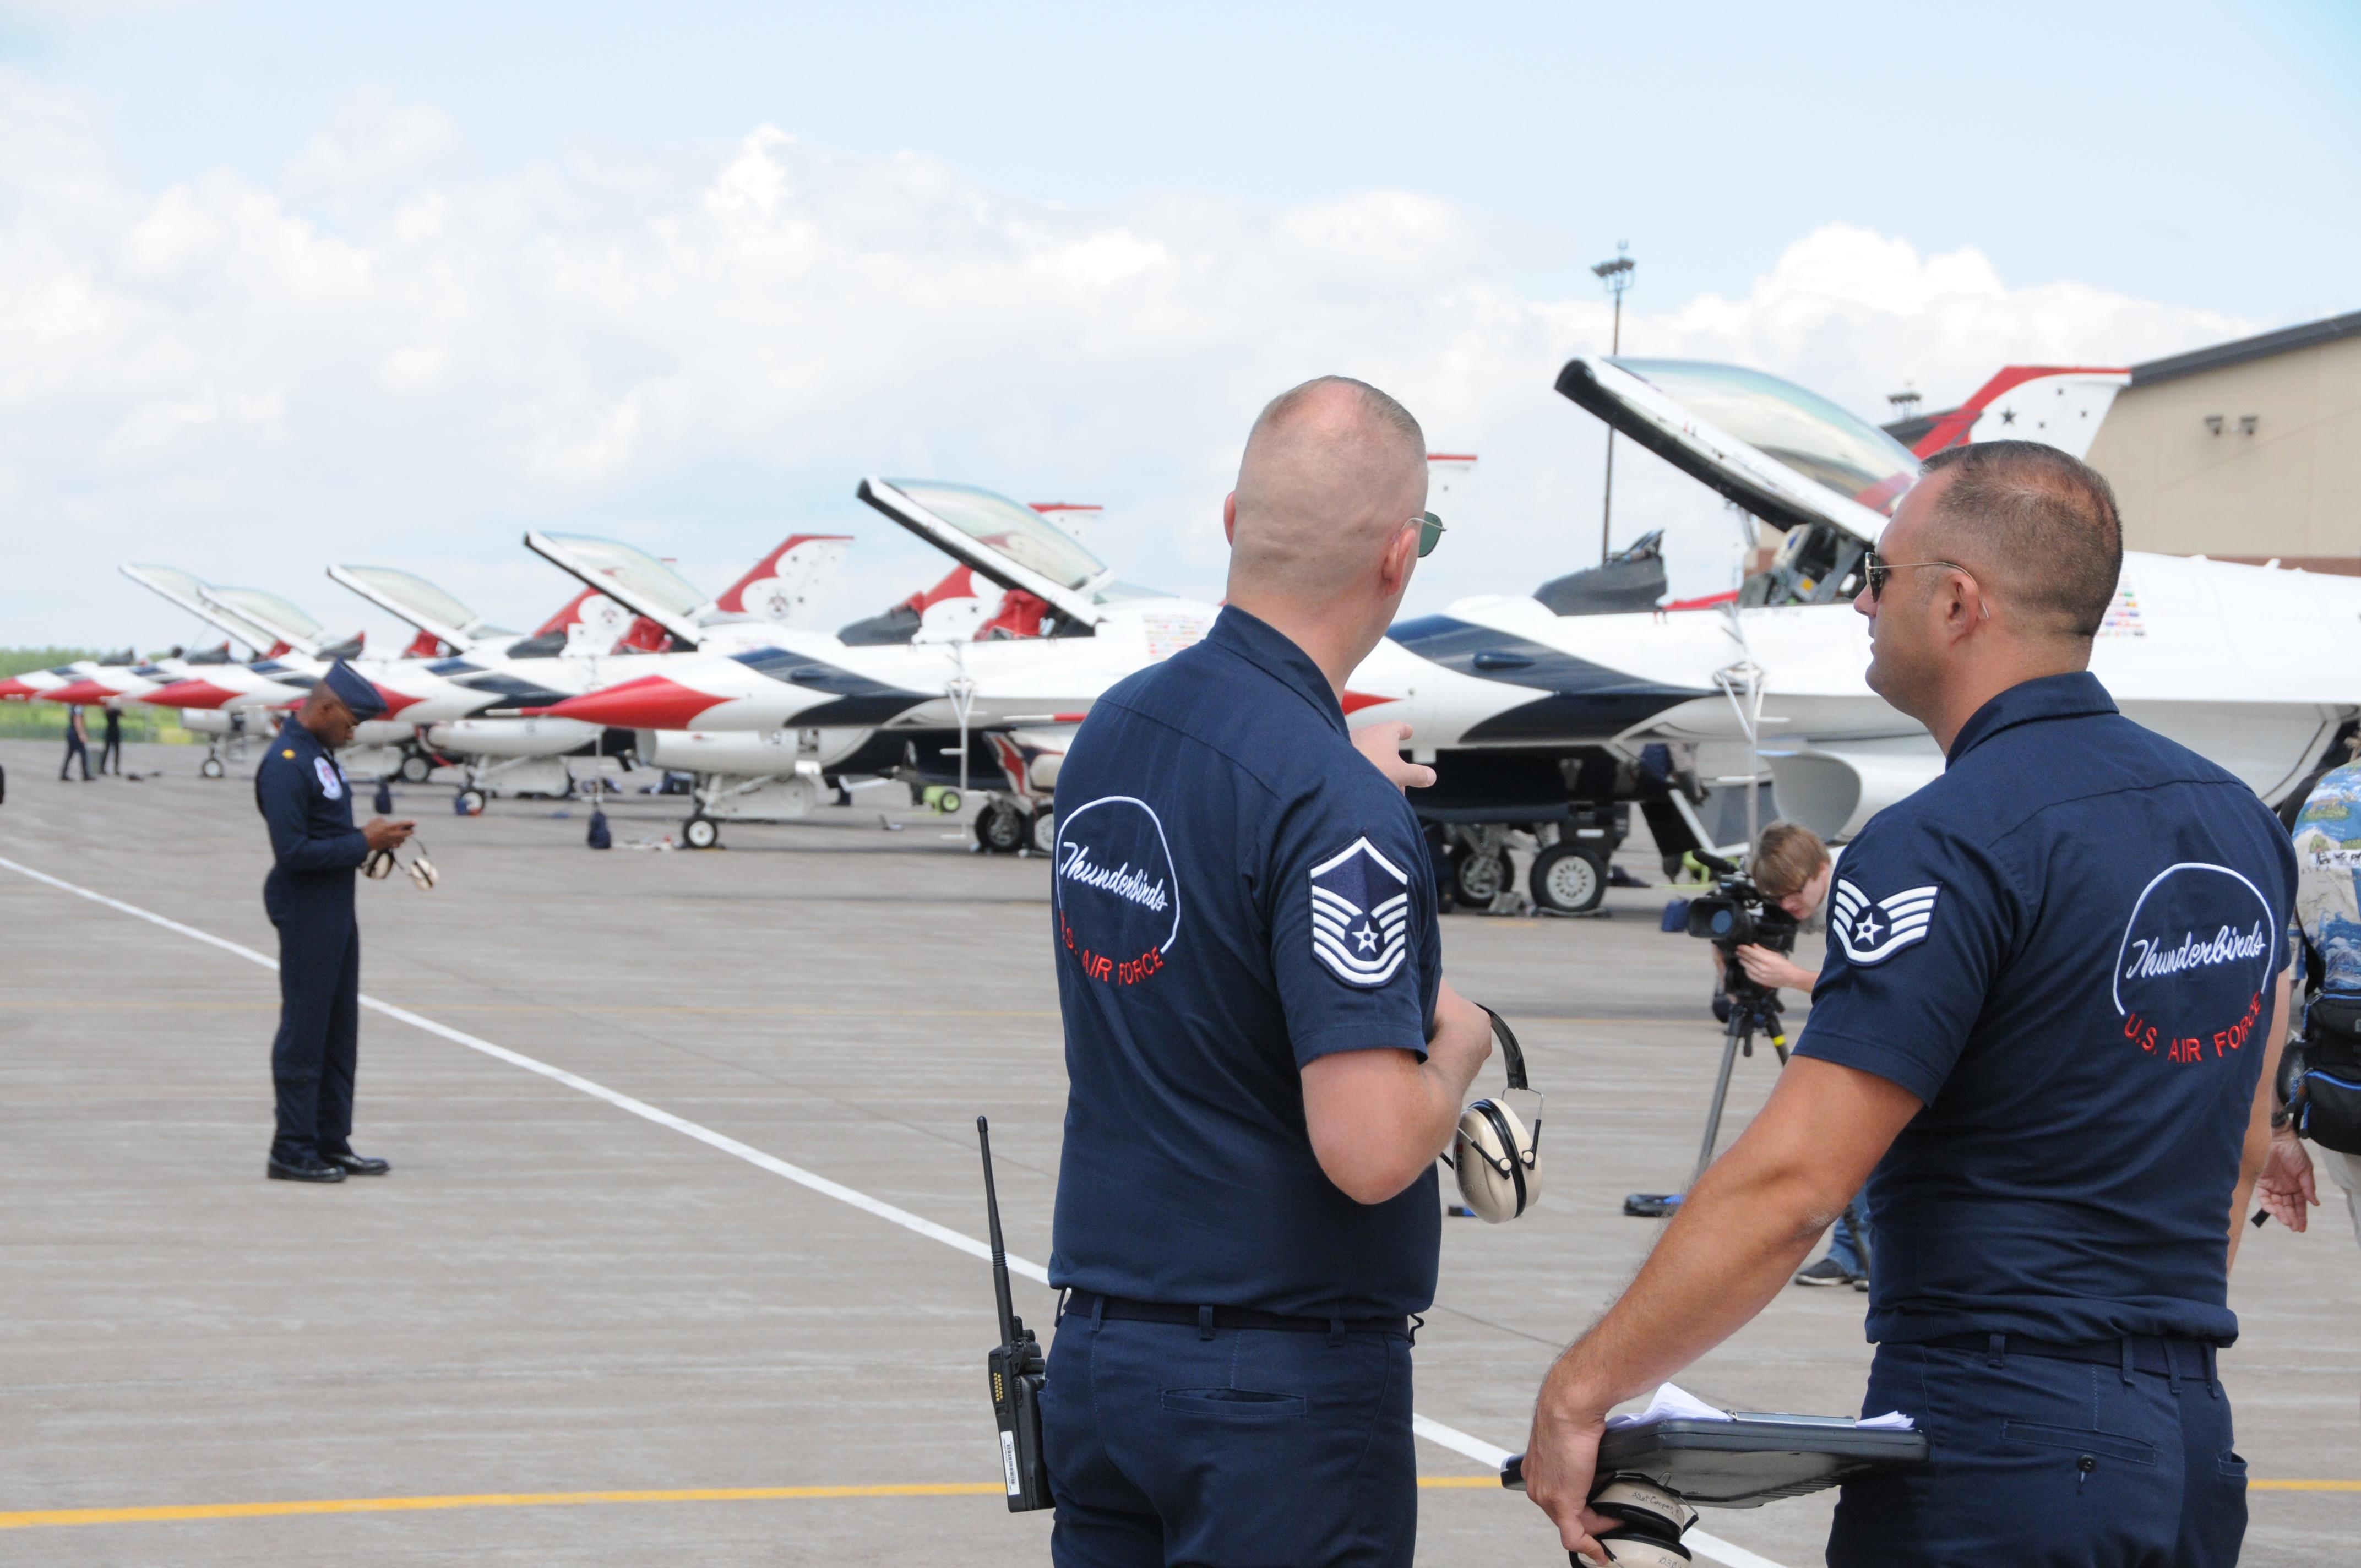 DOWNLOAD HI RES PHOTO DETAILS. U.S. Air Force Thunderbirds